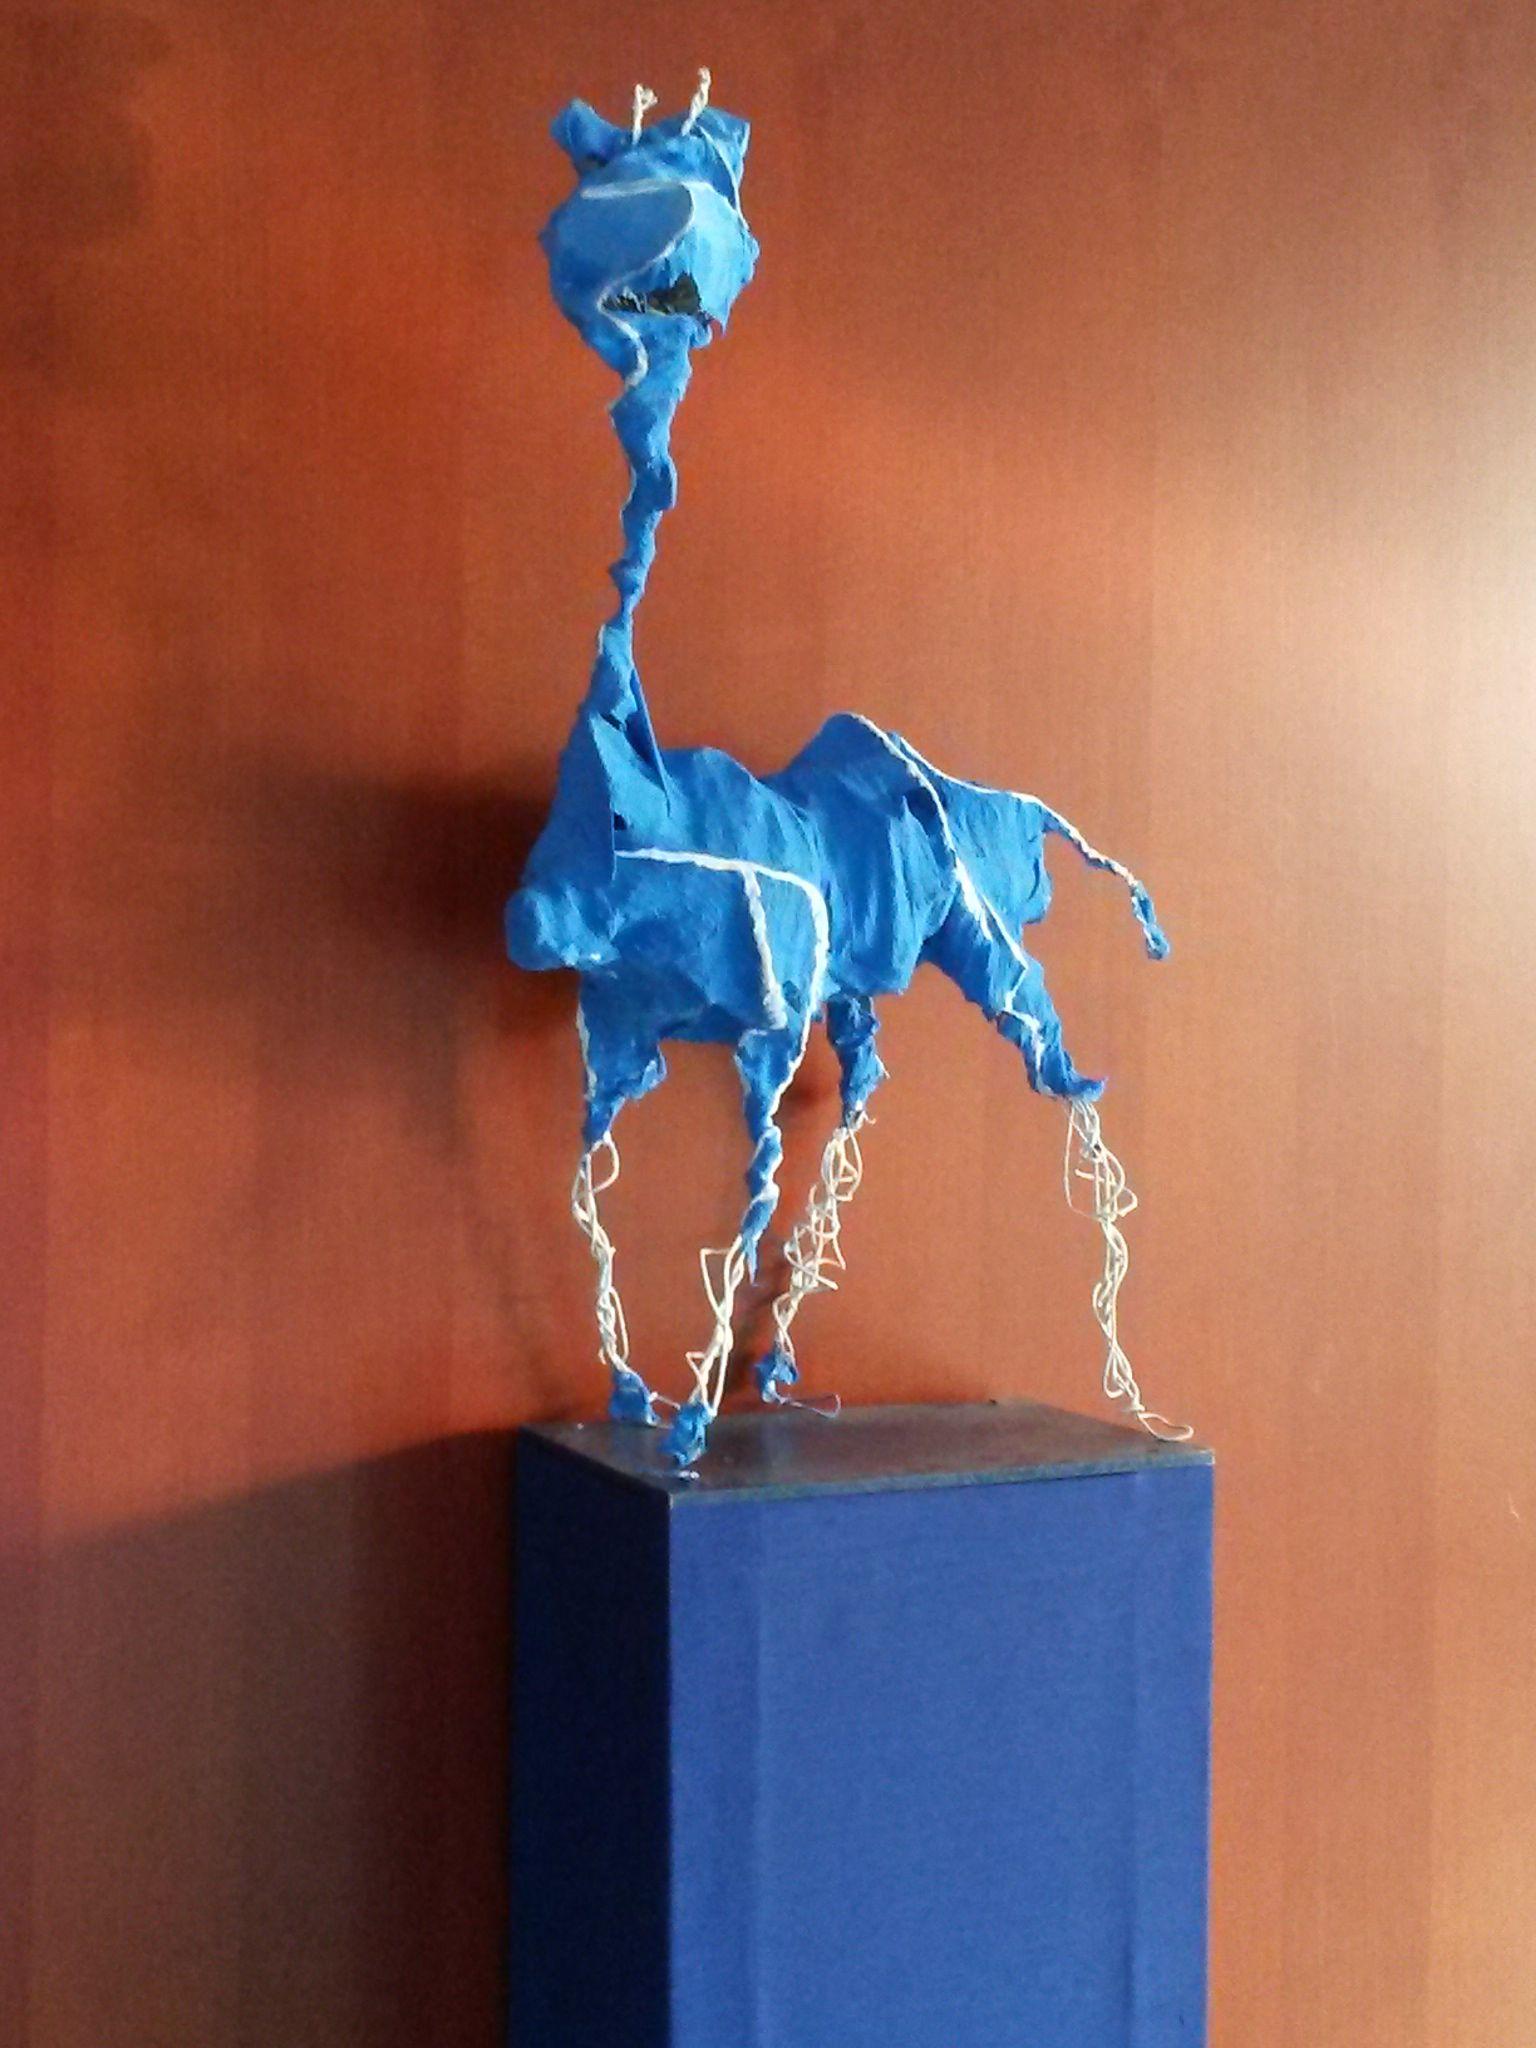 Draht-Gips-Tiere (Schülerarbeit) mit Acrylfarben bemalt ...